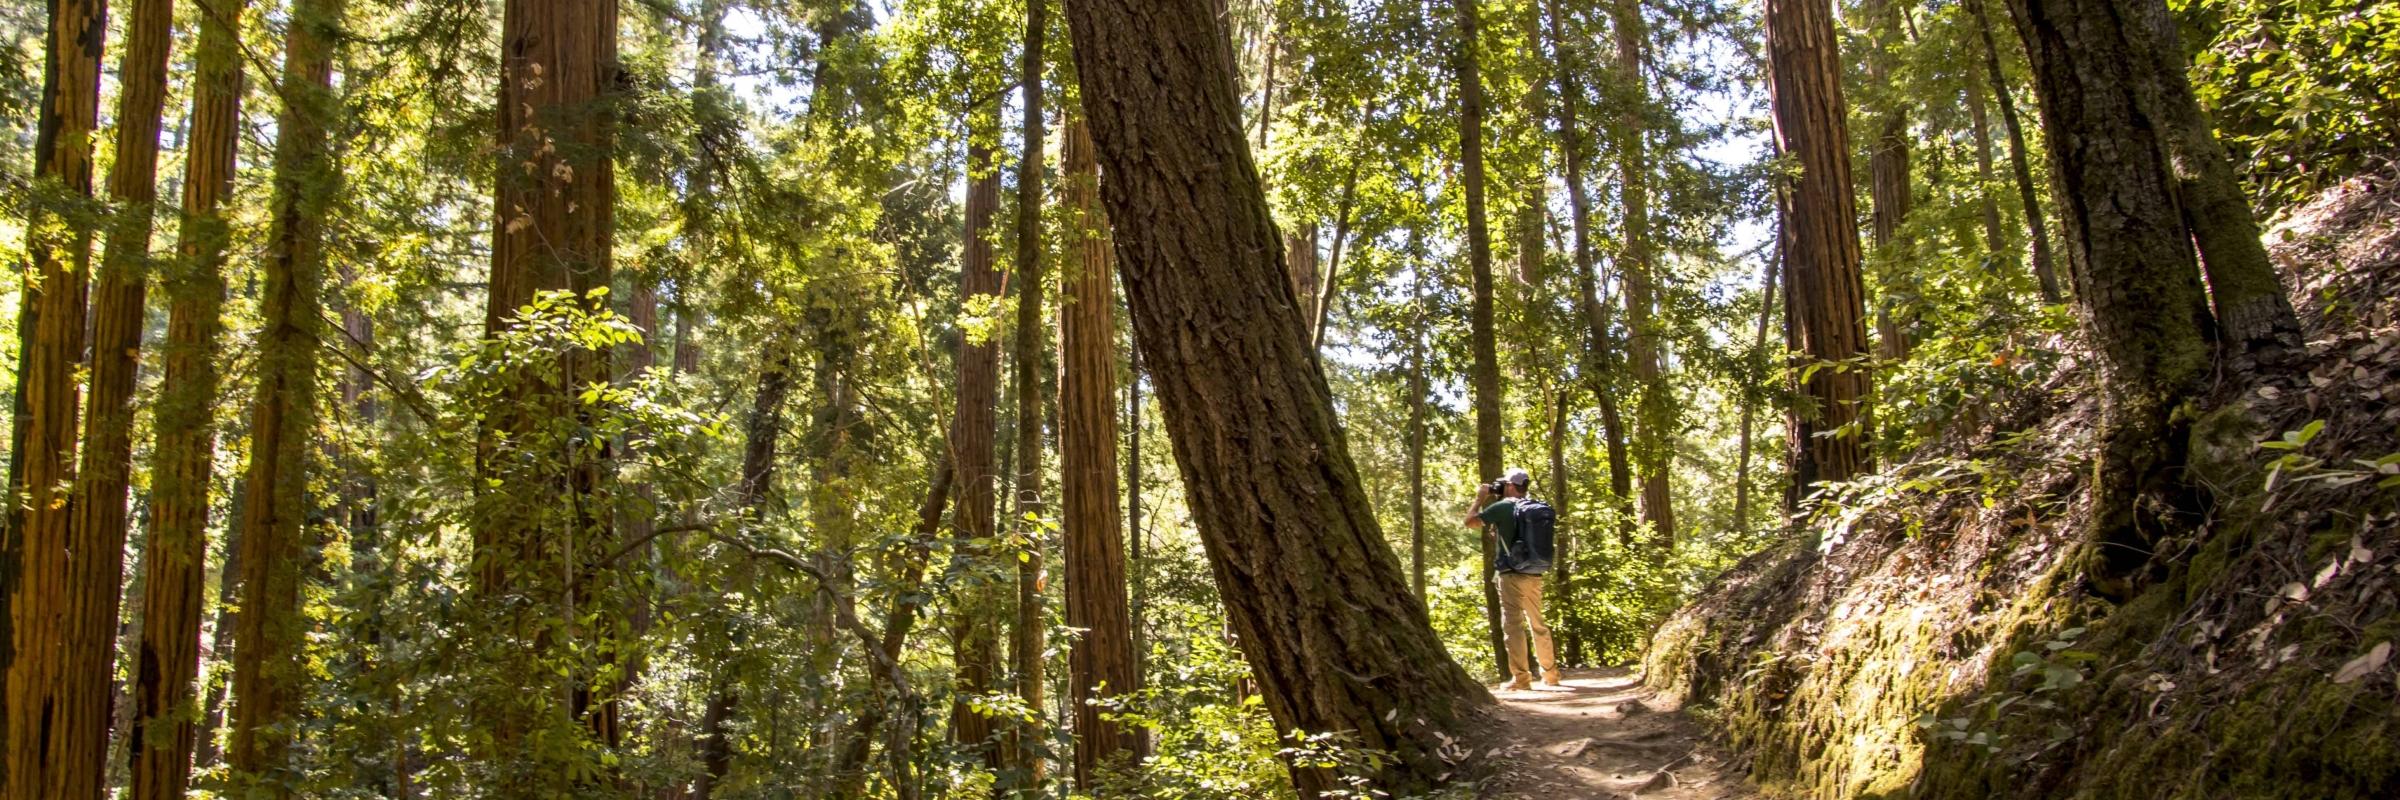 Sunset Trail Big Basin Redwoods SP Santa Cruz